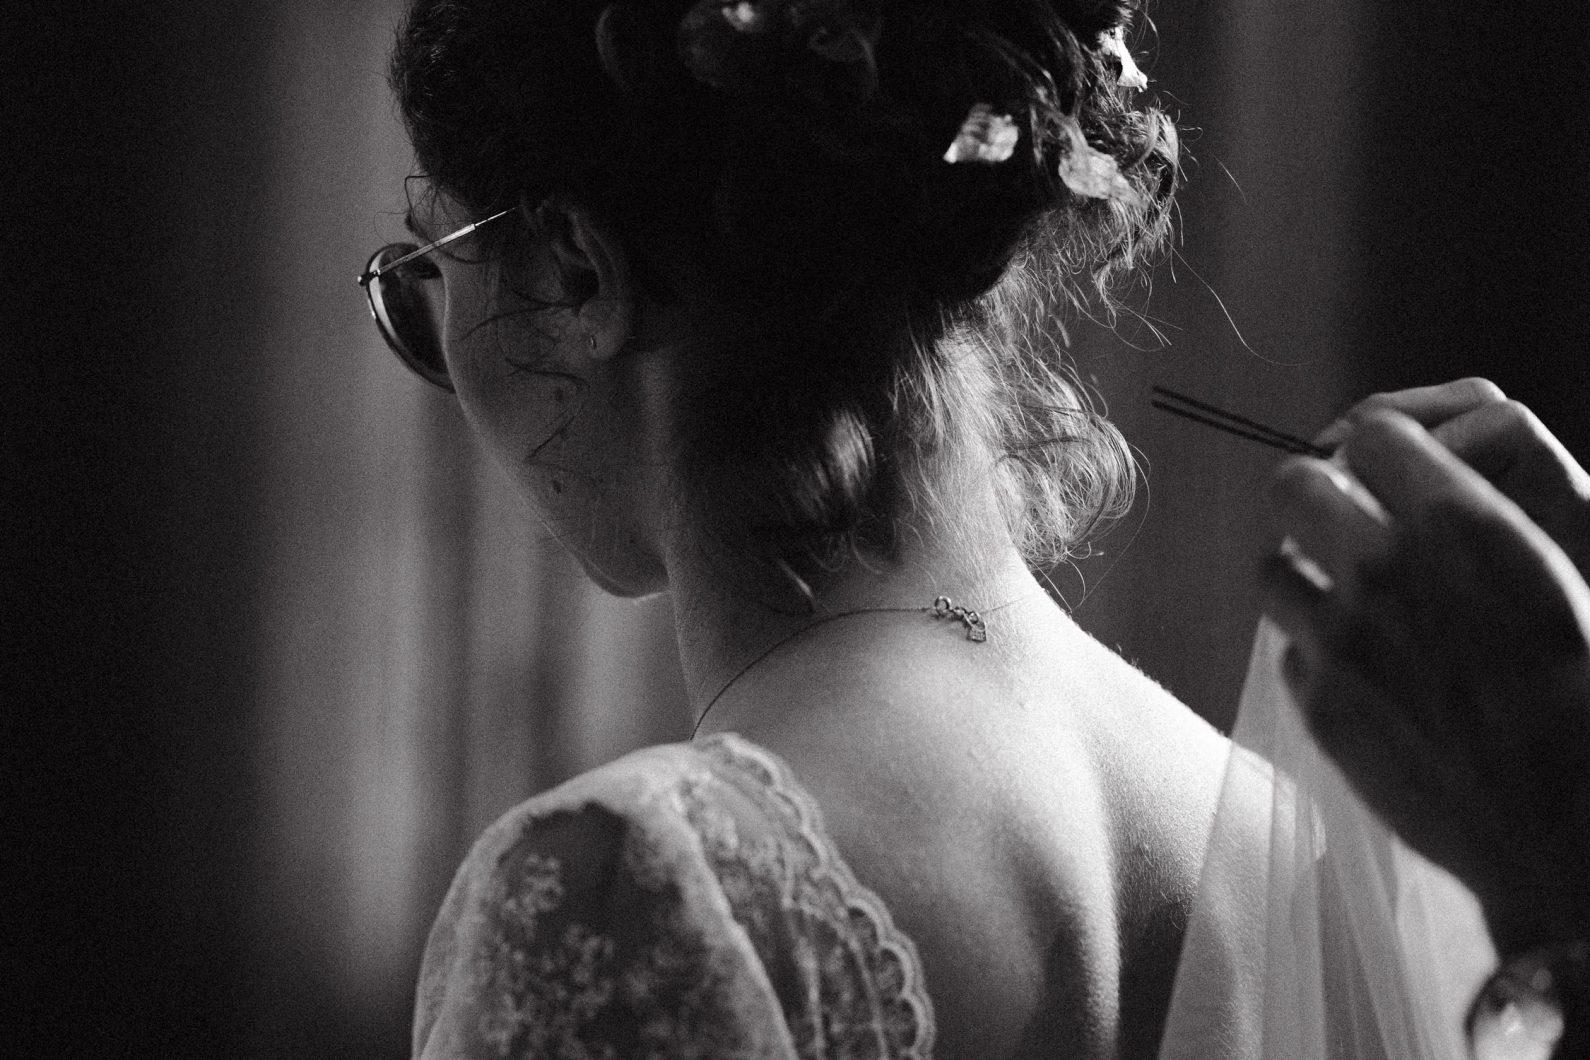 wedding_getting_ready_dan_jenson_photography_villa_maund_4